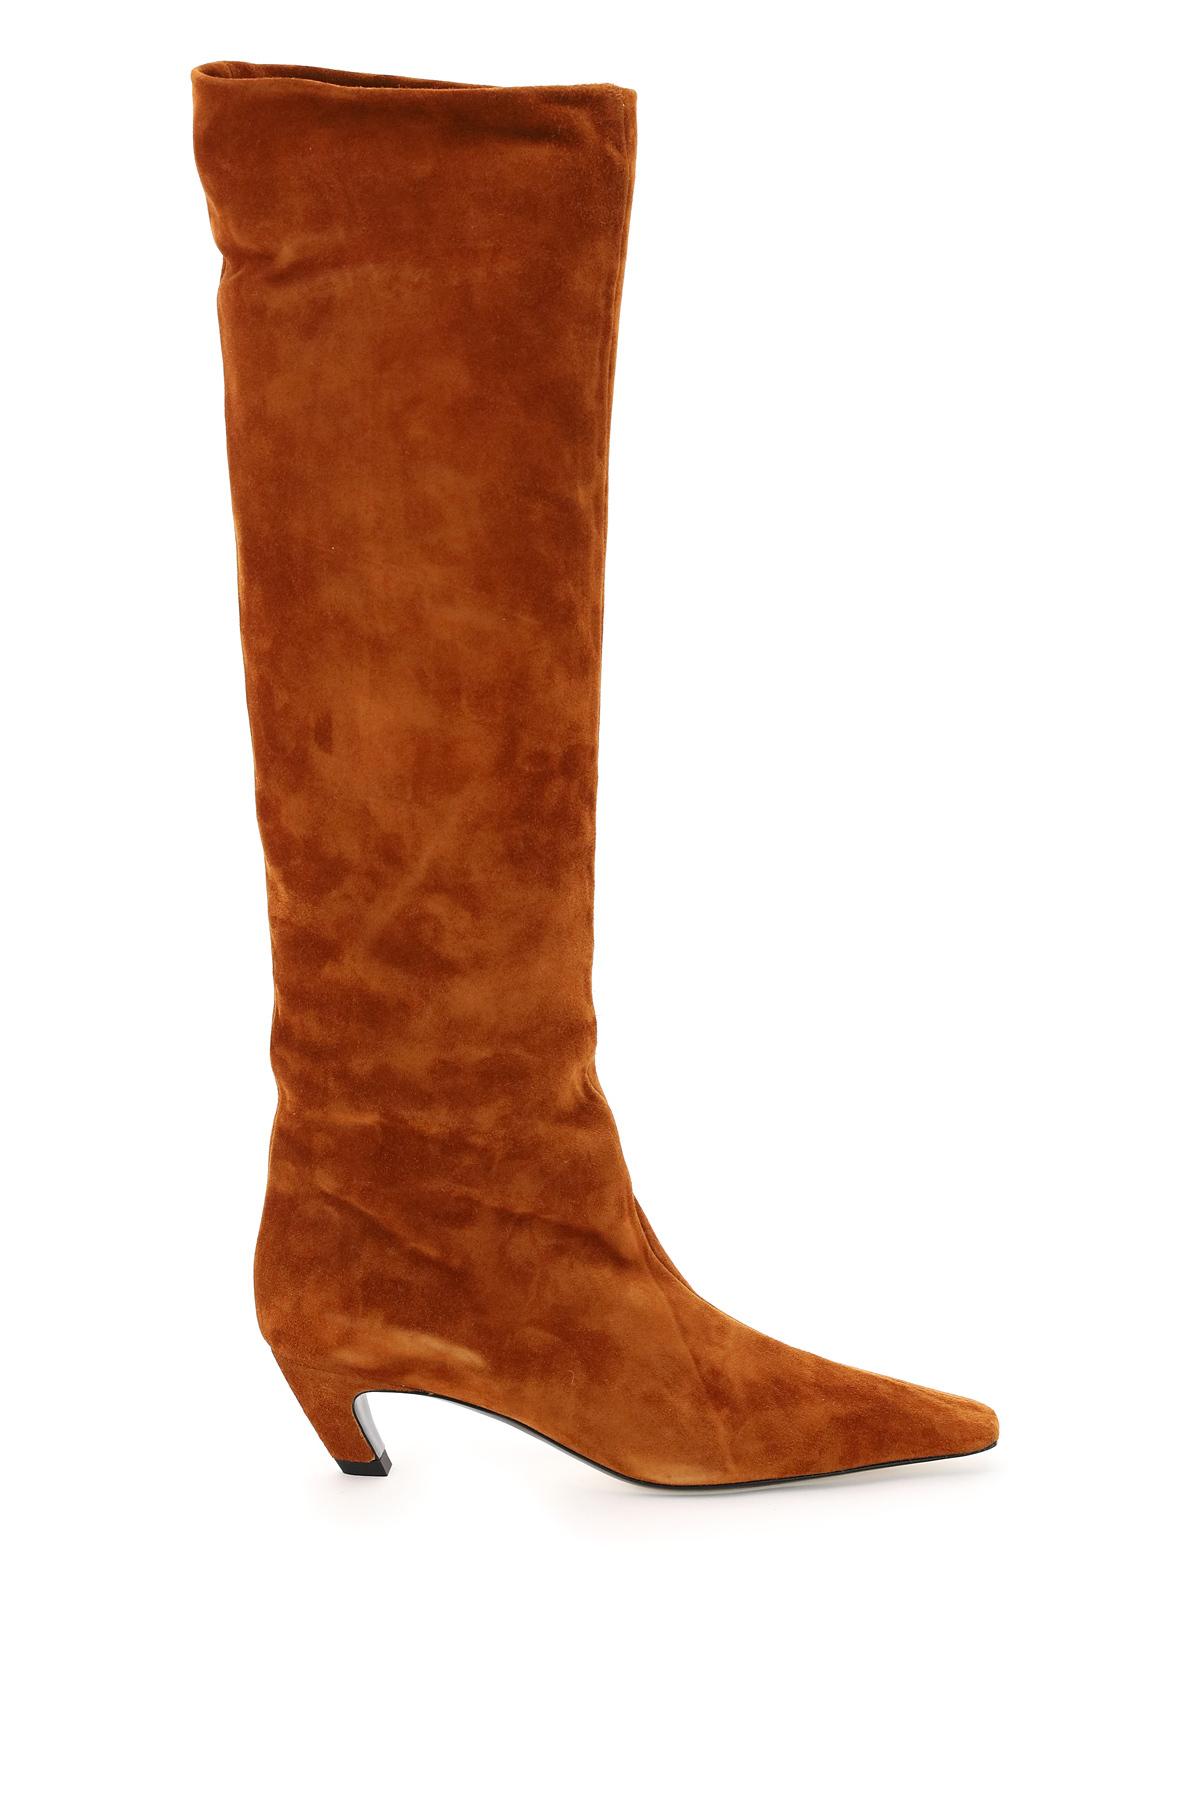 KHAITE DAVIS KNEE-HIGH SUEDE BOOTS 37 Brown, Orange Leather